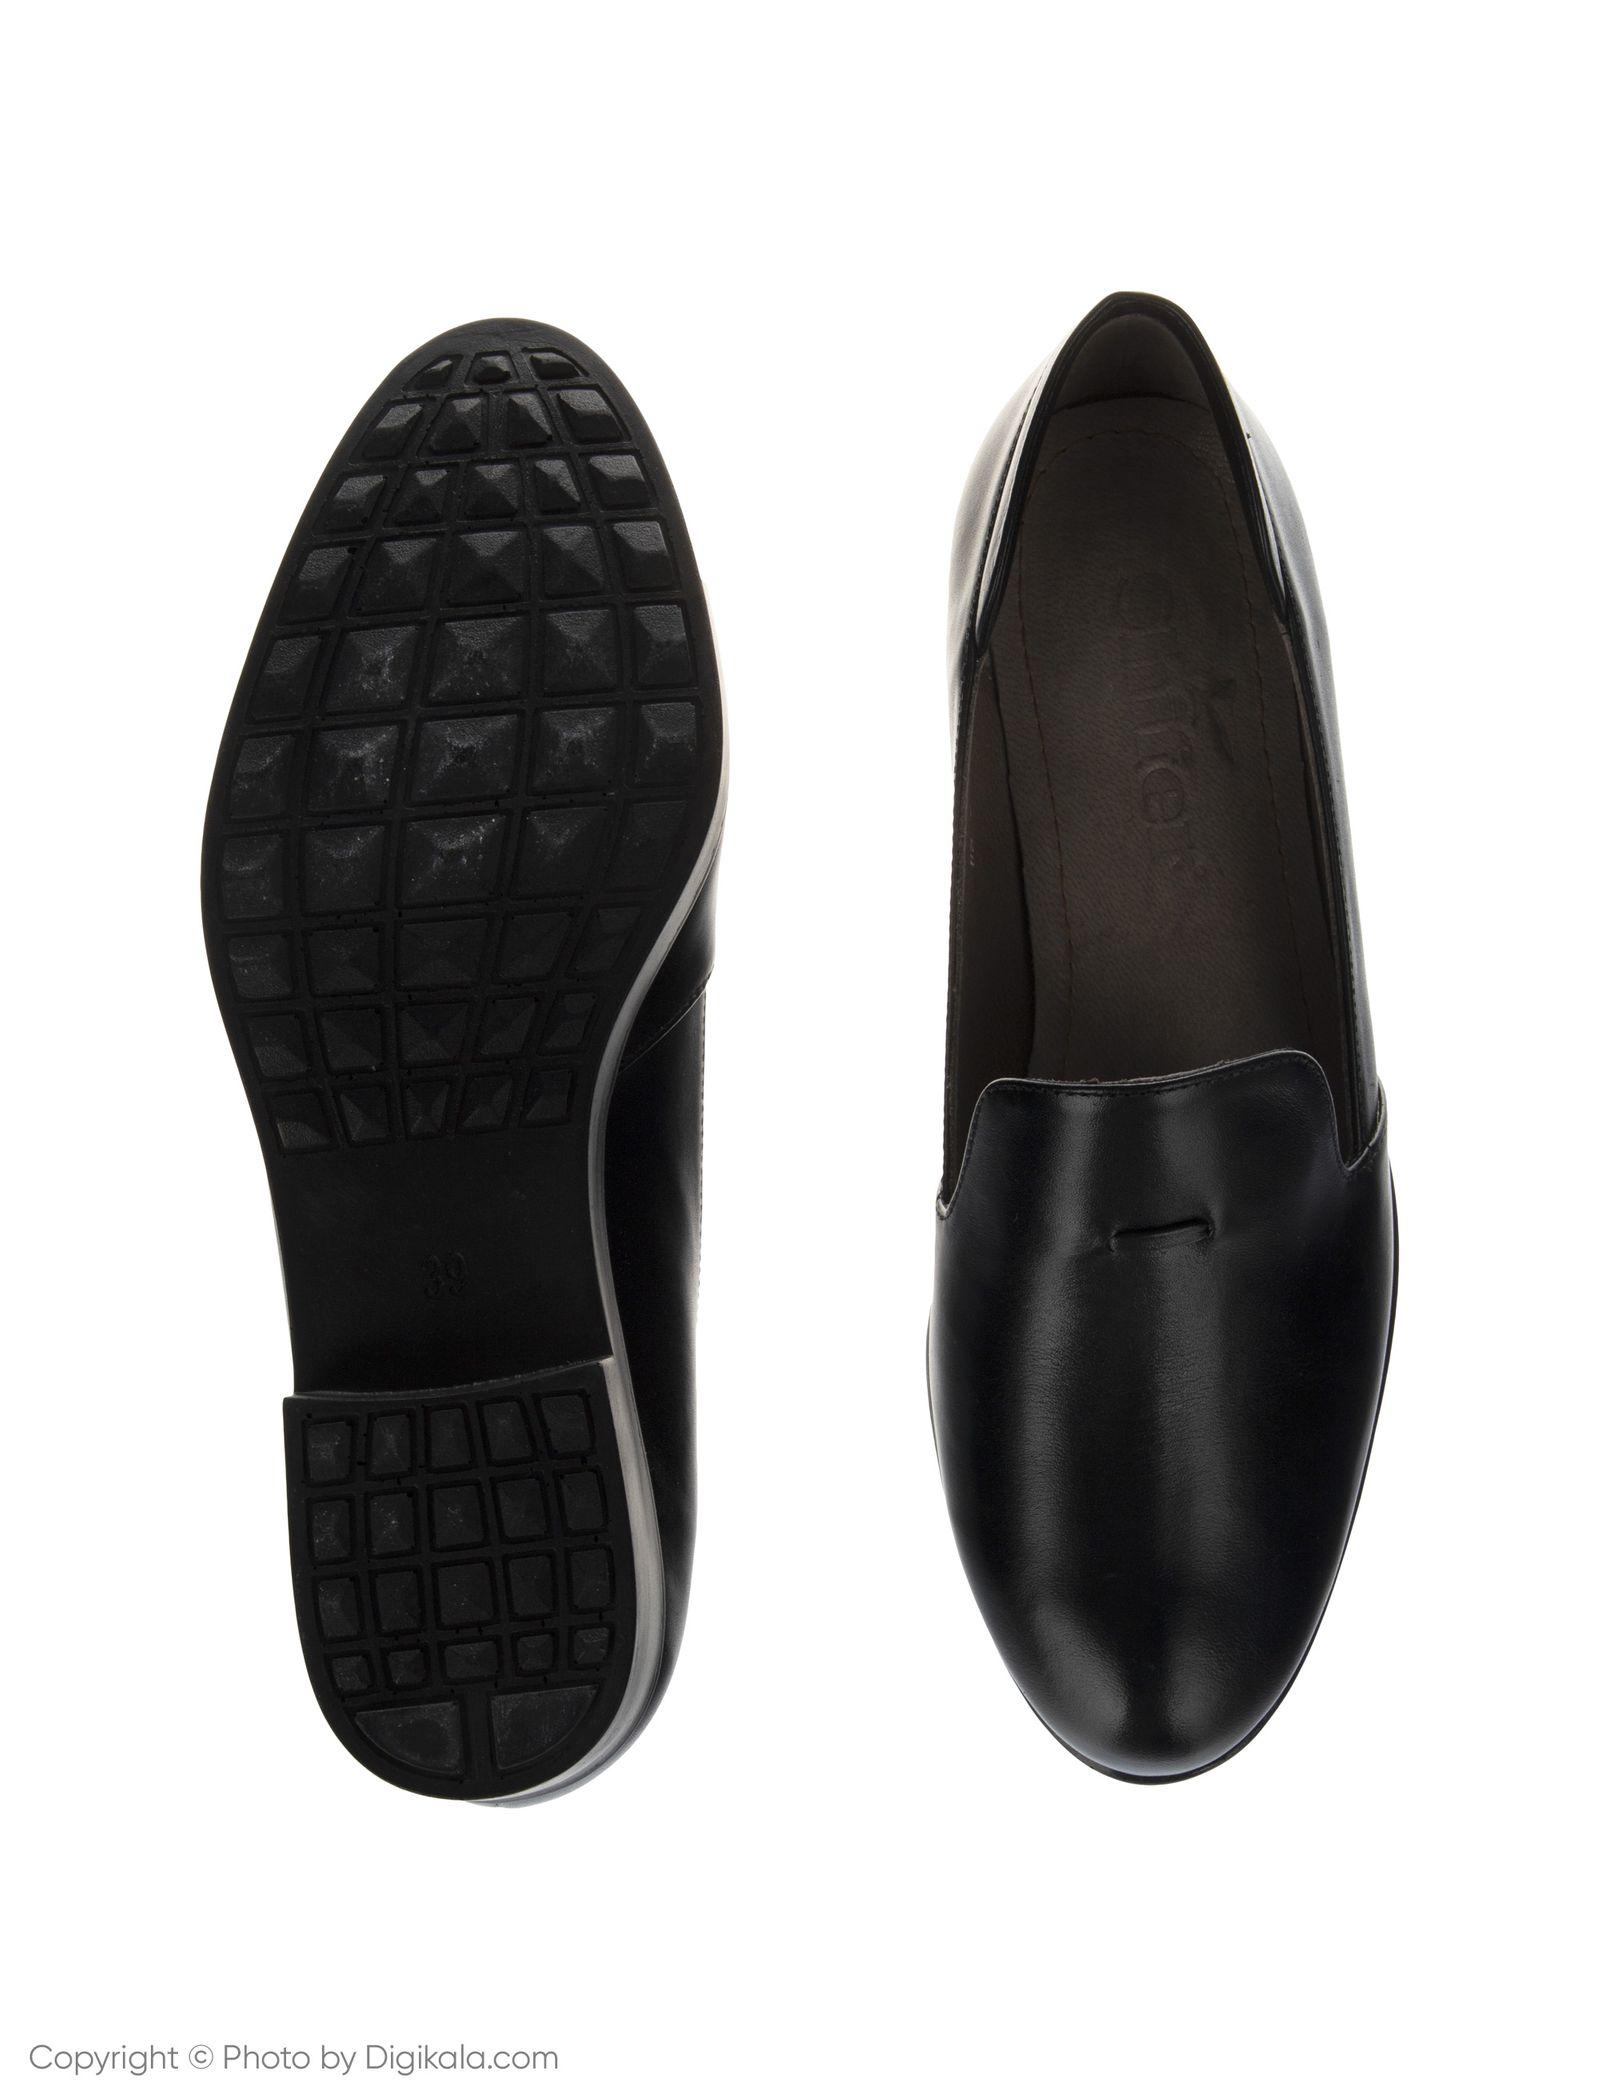 کفش روزمره زنانه شیفر مدل 5190A-101 -  - 5